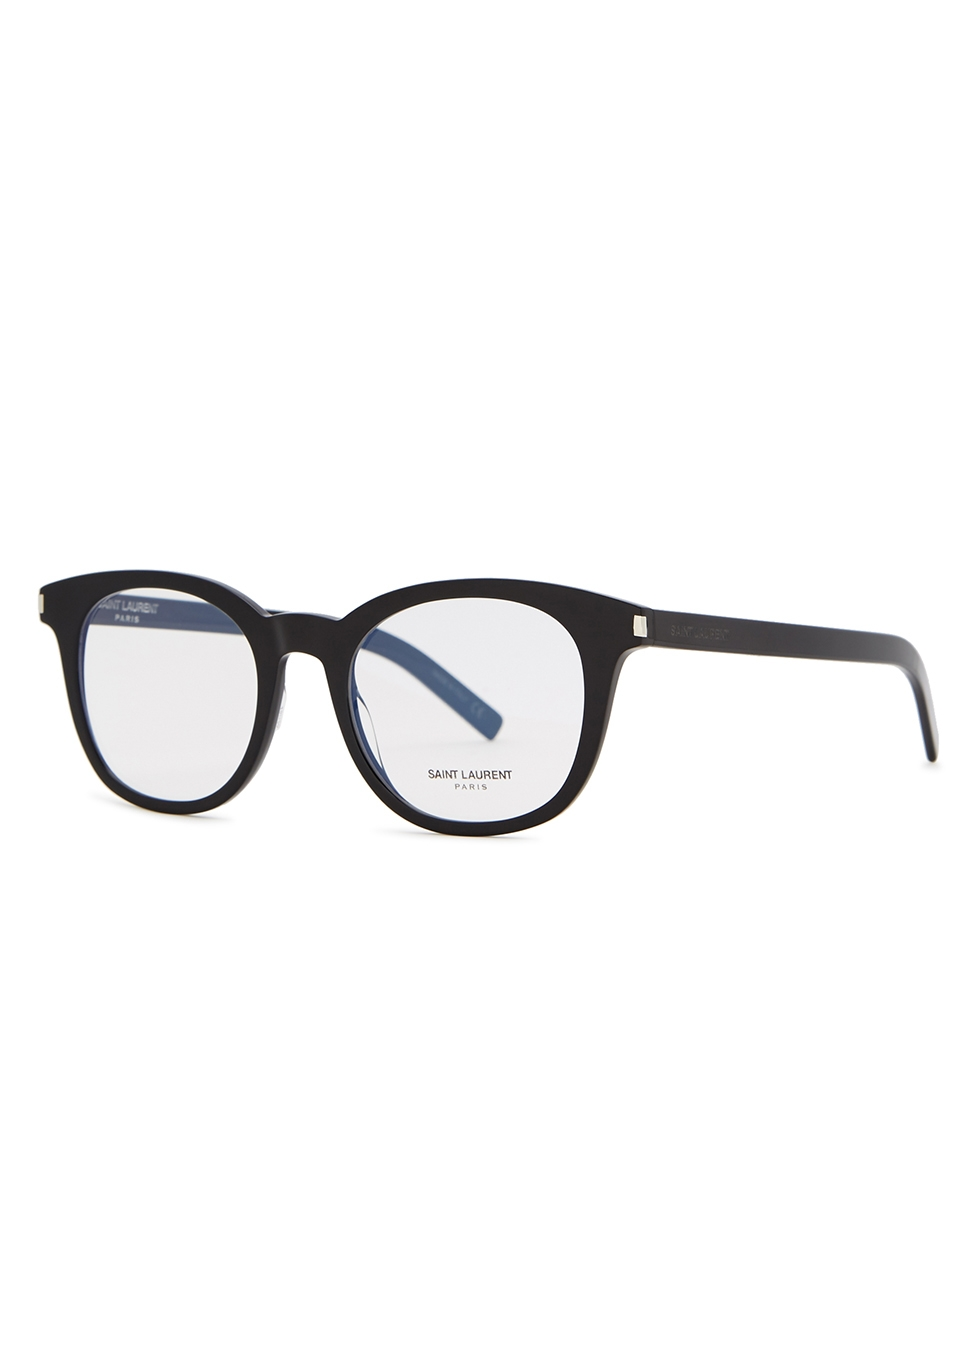 SL289 tortoiseshell optical glasses - Saint Laurent